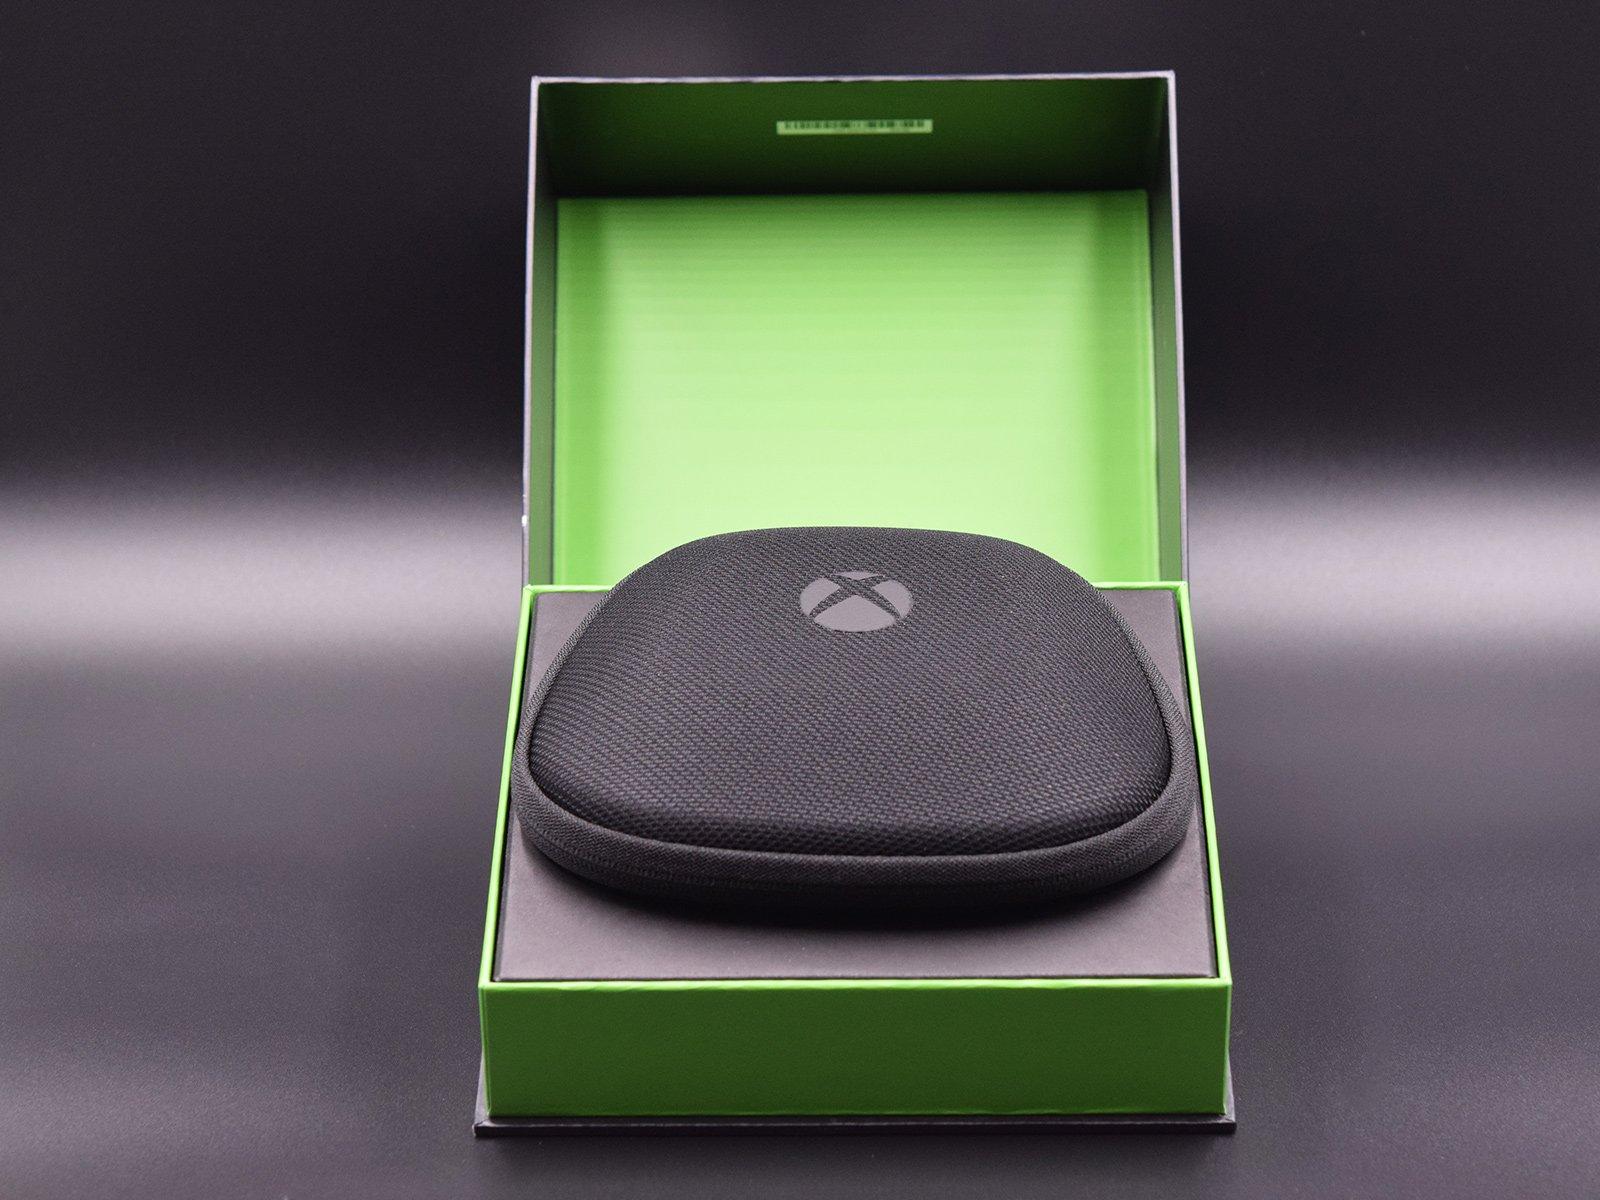 Xbox Elite Controller View 13